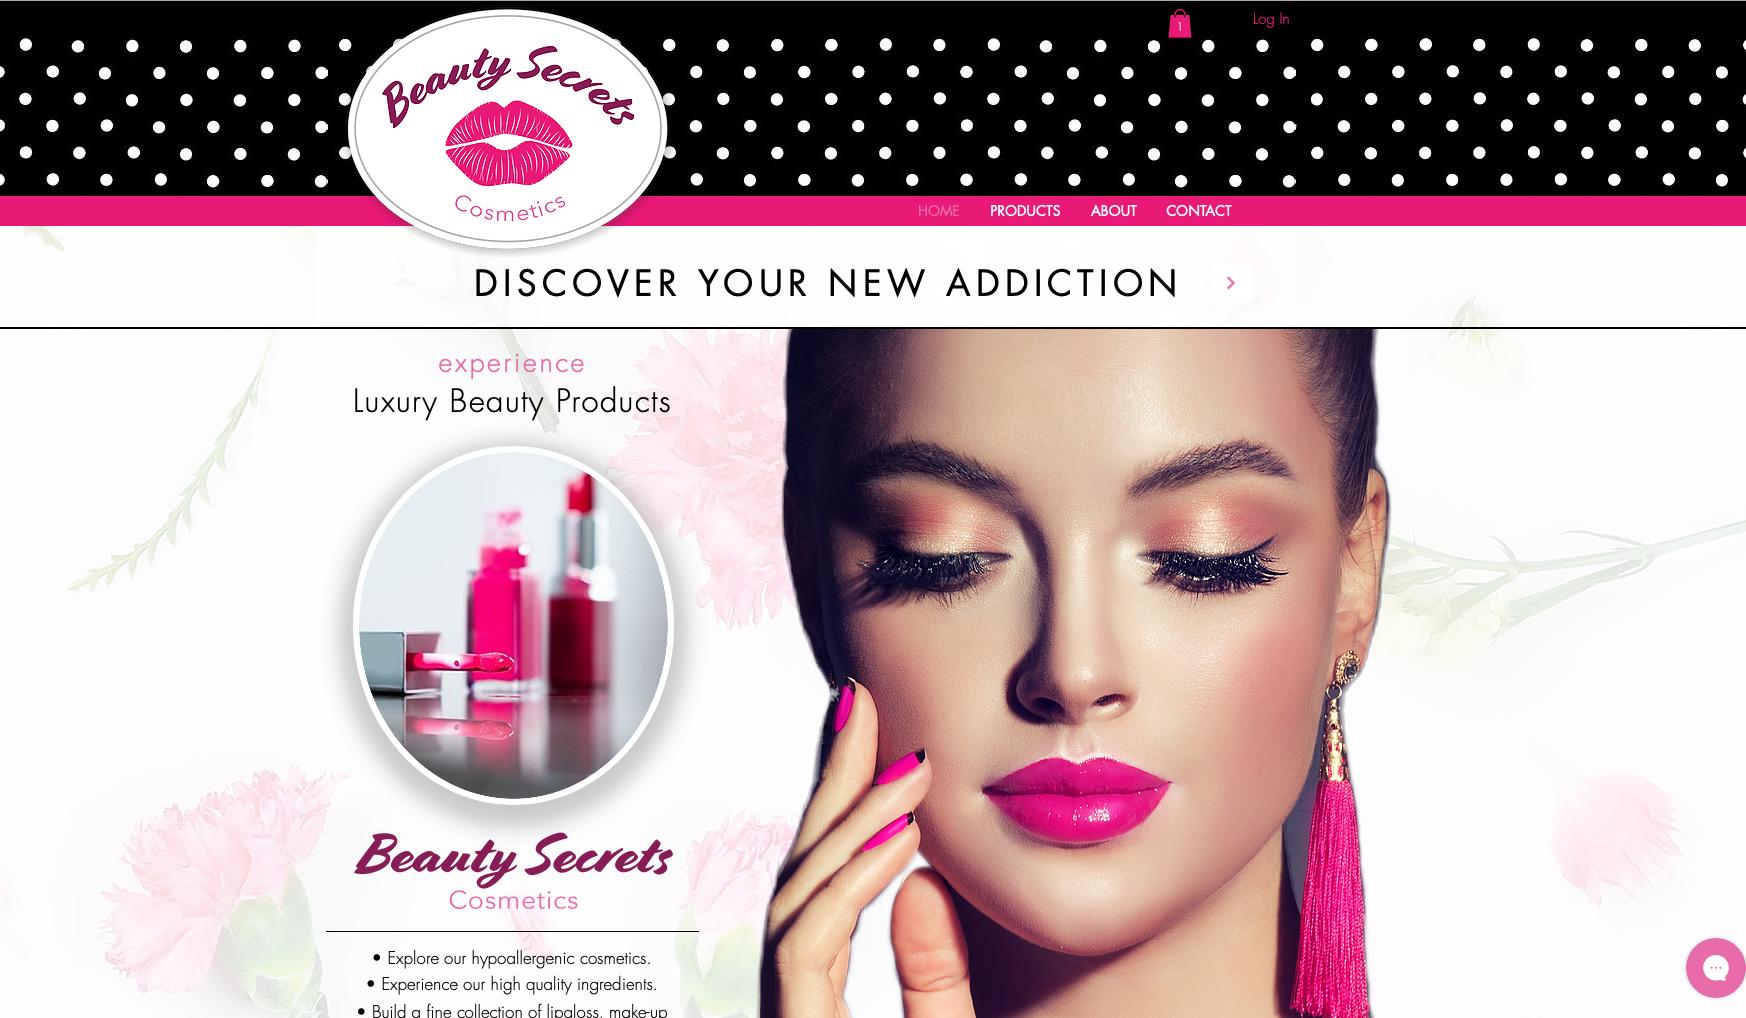 beautysecretscosmetics.com